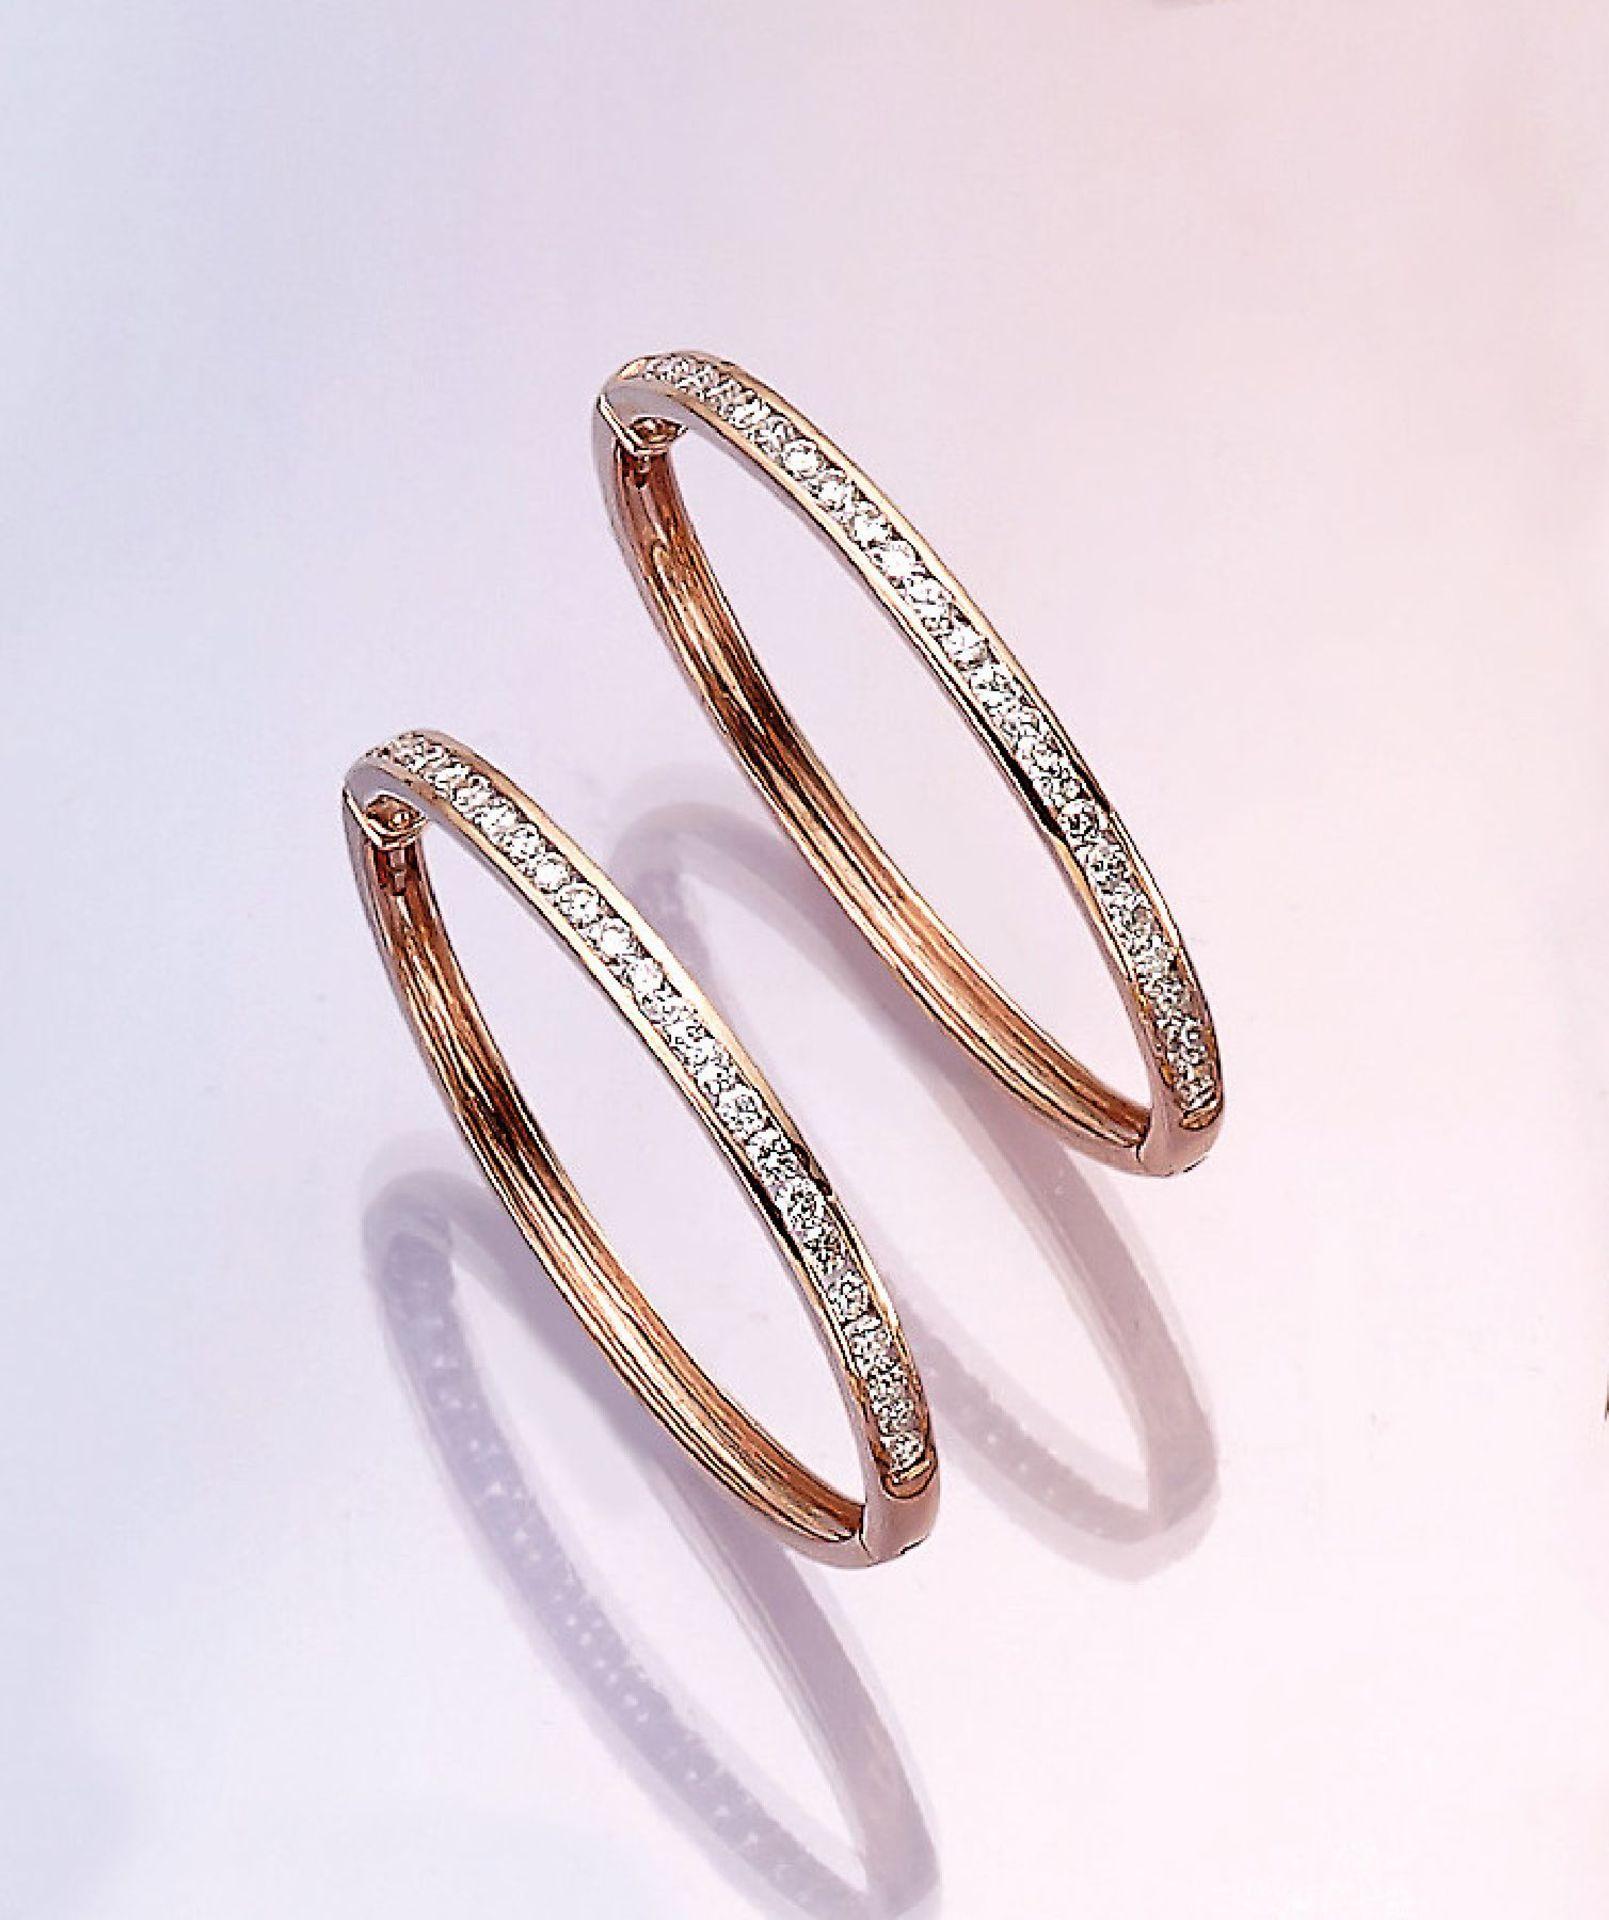 Los 31519 - Pair of big 14 kt gold hoop earrings with brilliants , RG 750/000, 48 brilliants totalapprox. 1.70